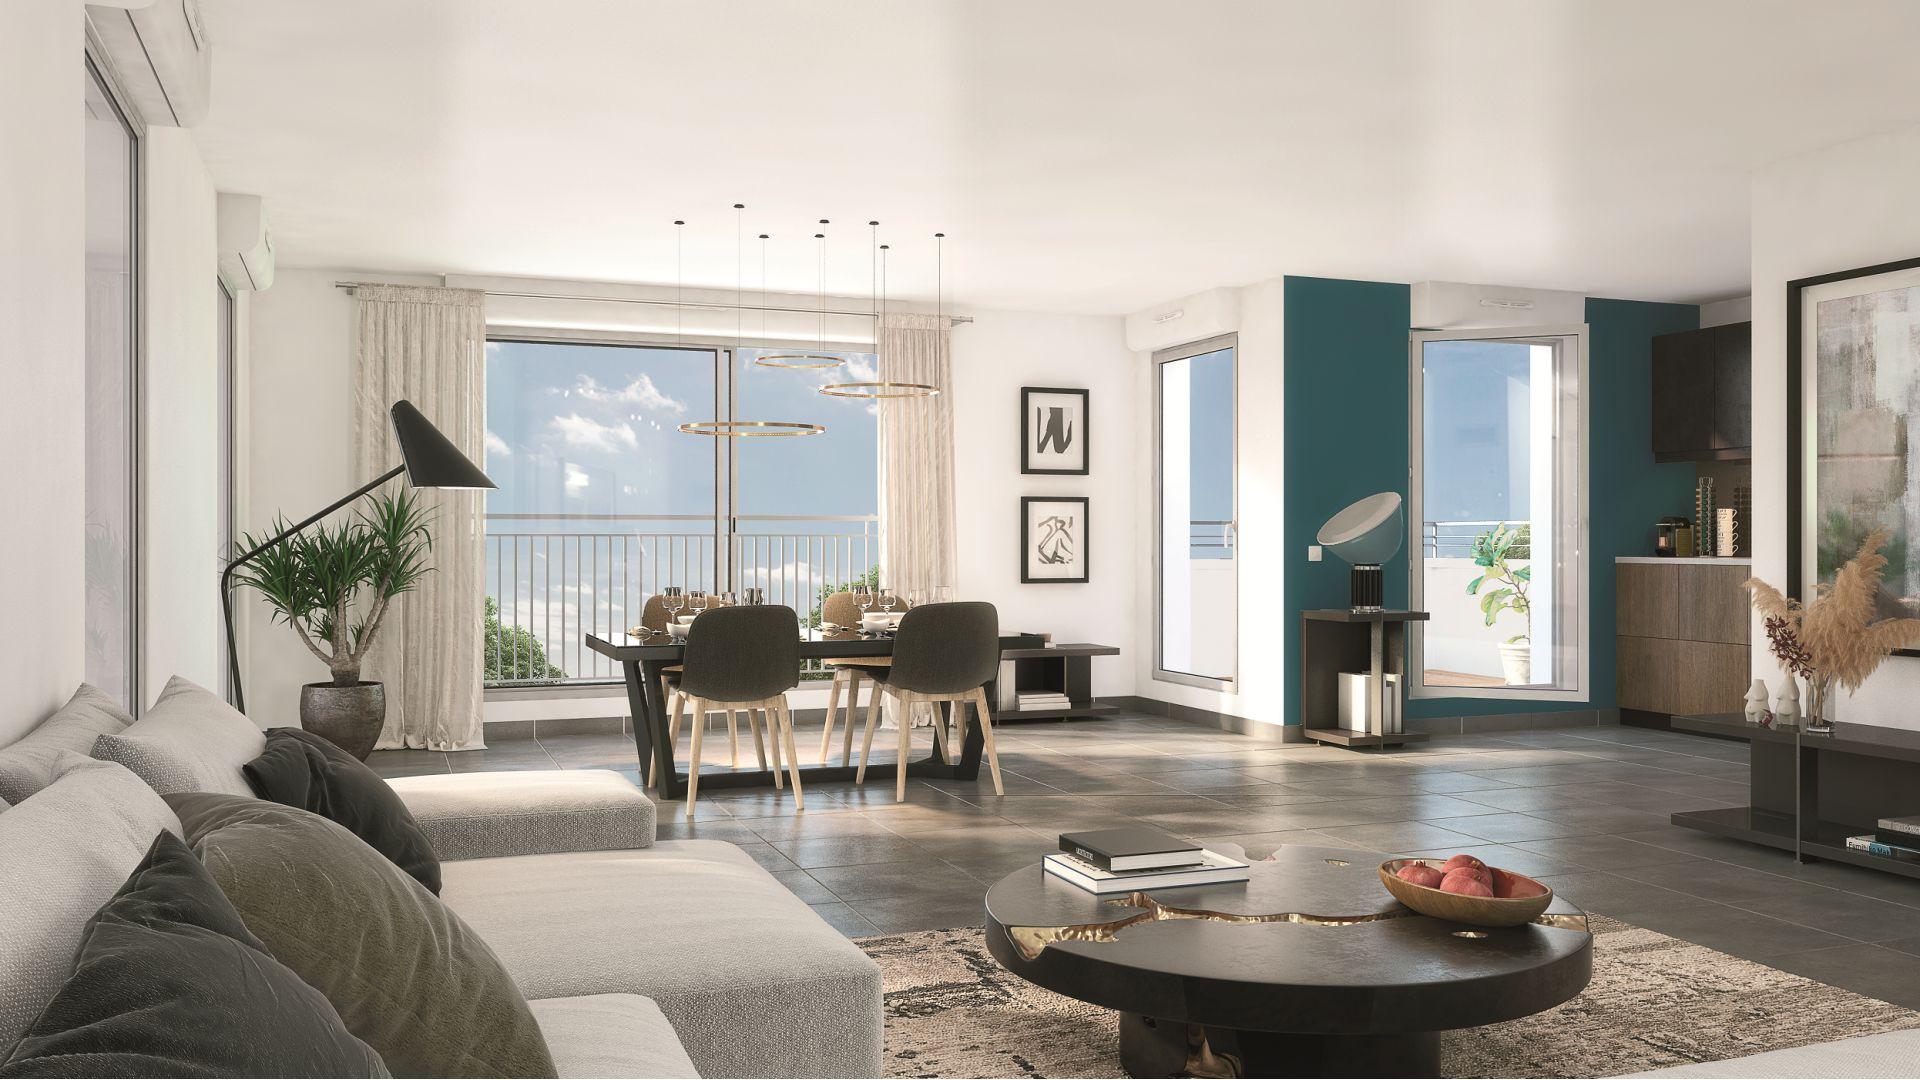 GreenCity immobilier - Champigny sur Marne - 94500 - residence le belvedere - immobilier neuf du T1Bis au T4 - vue intérieure